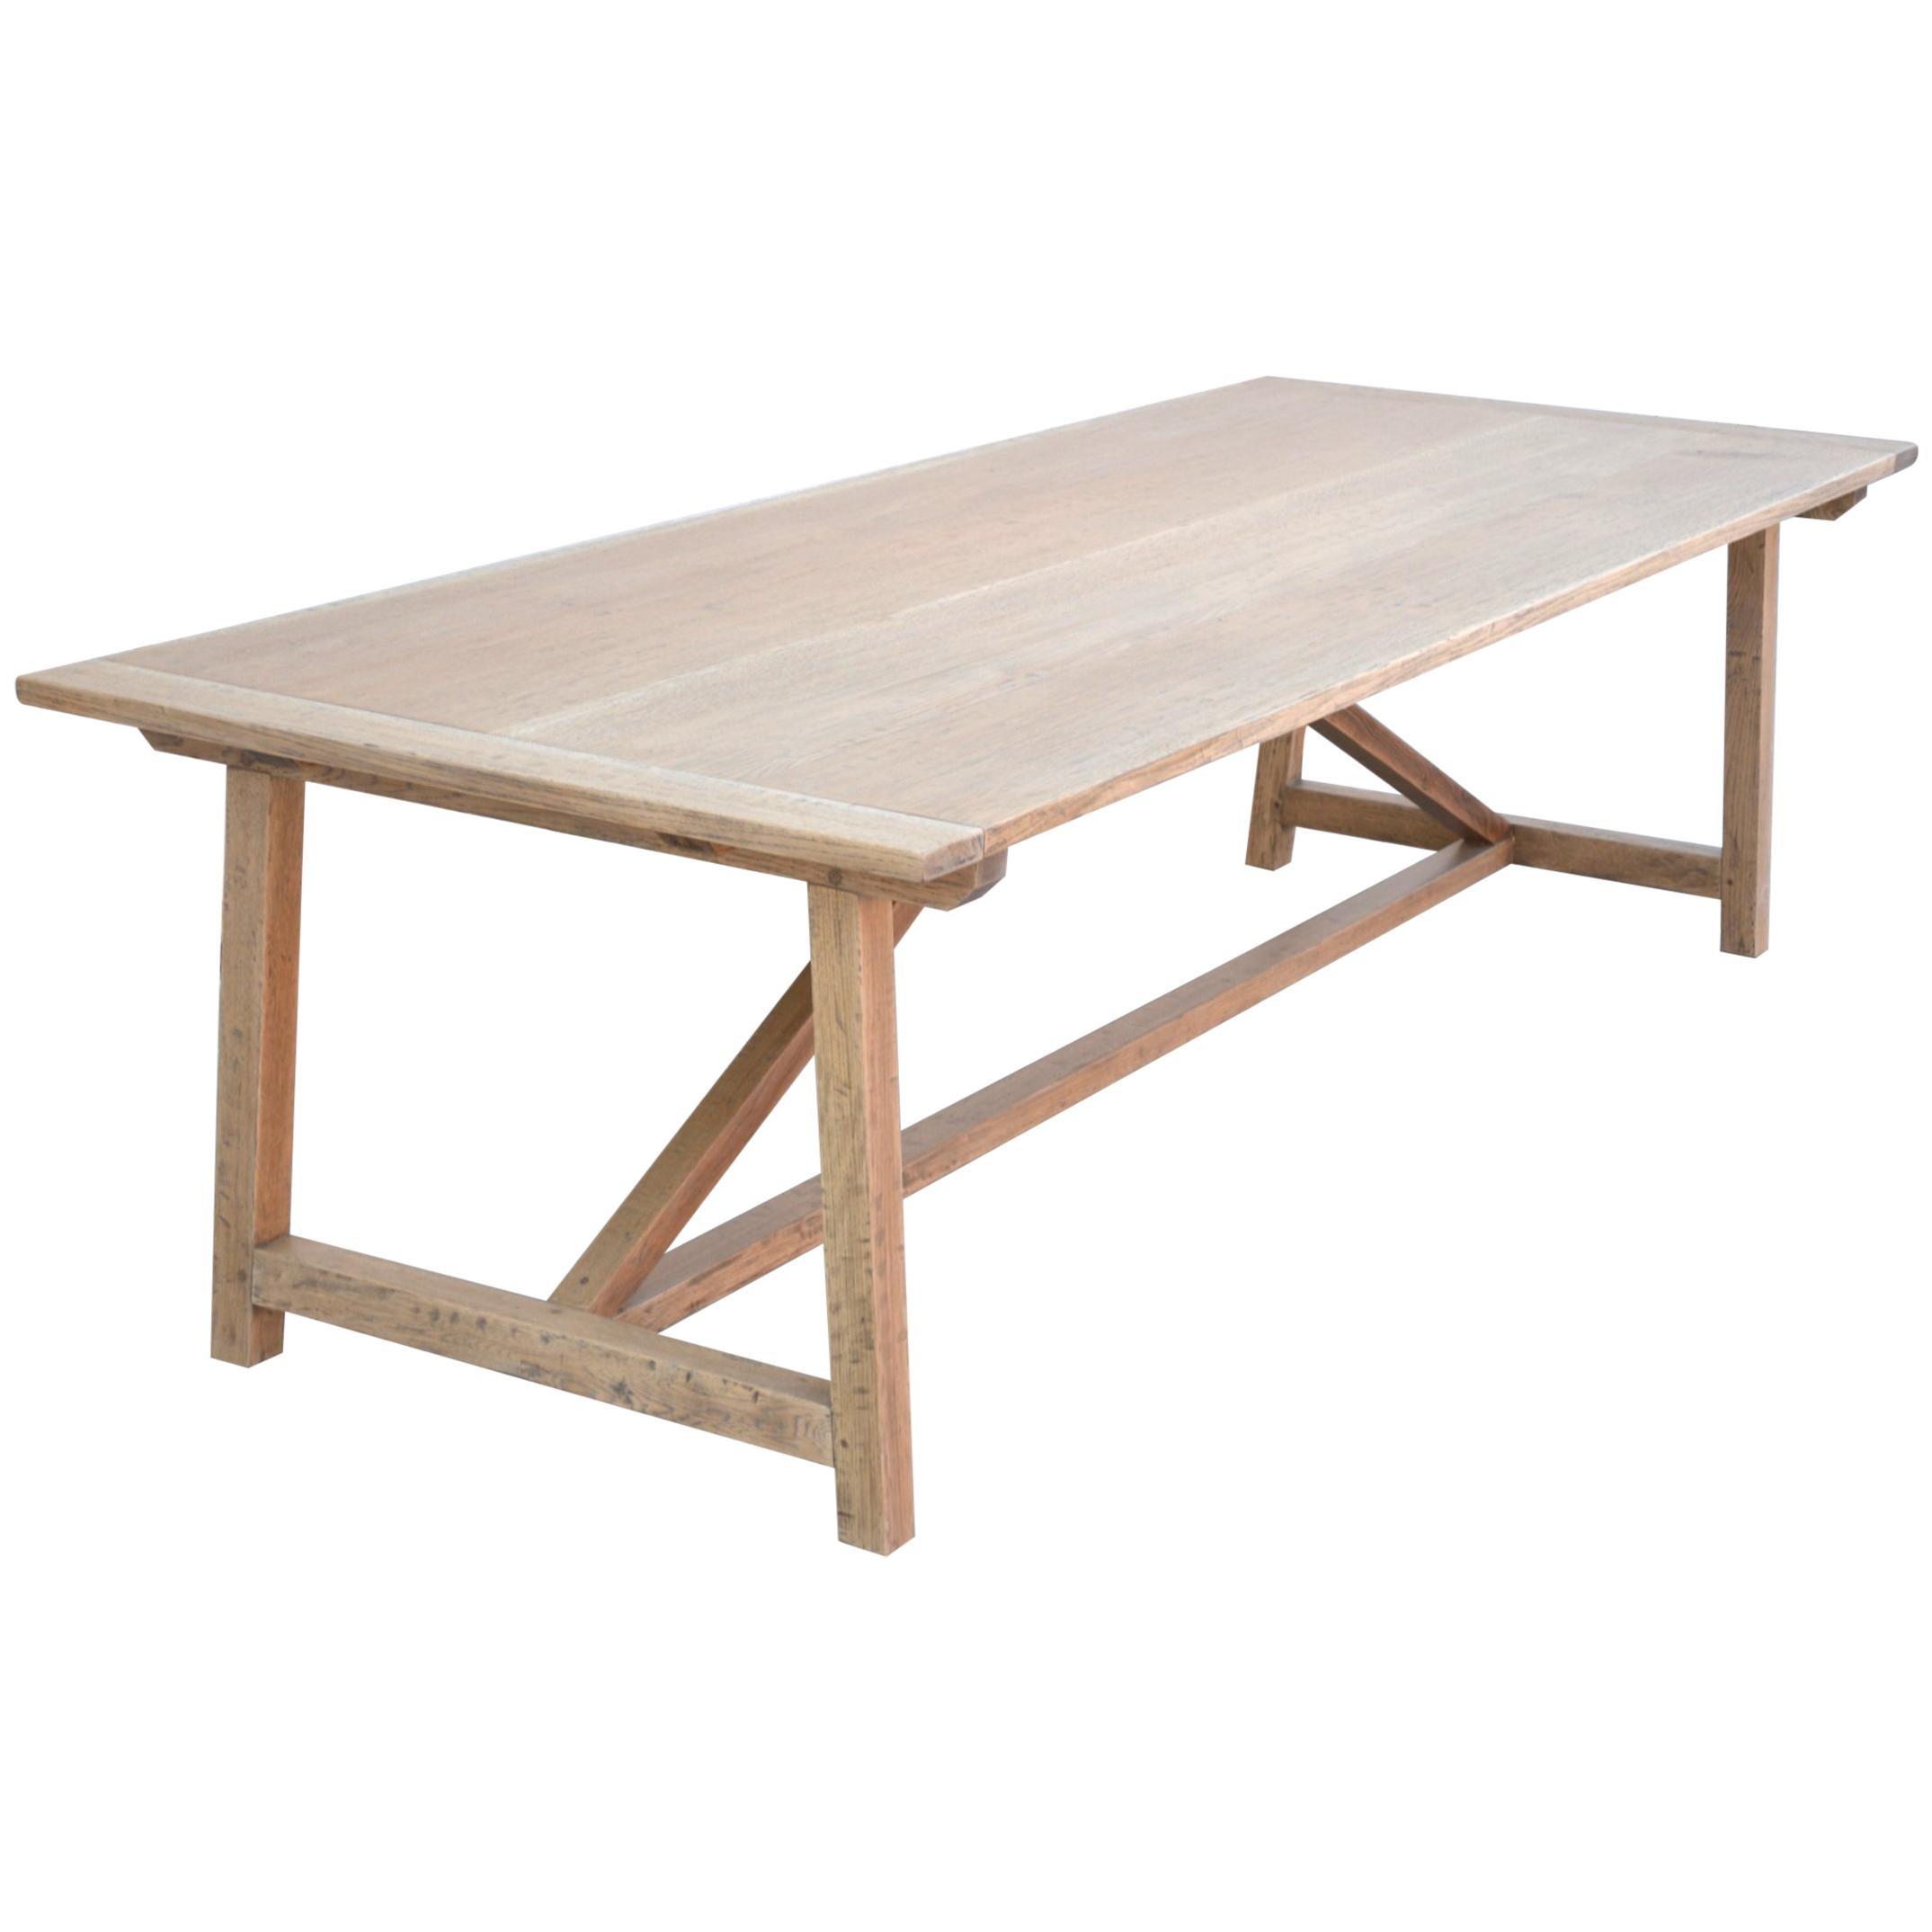 Custom Expandable Farm Table in Distressed Rift Sawn Oak